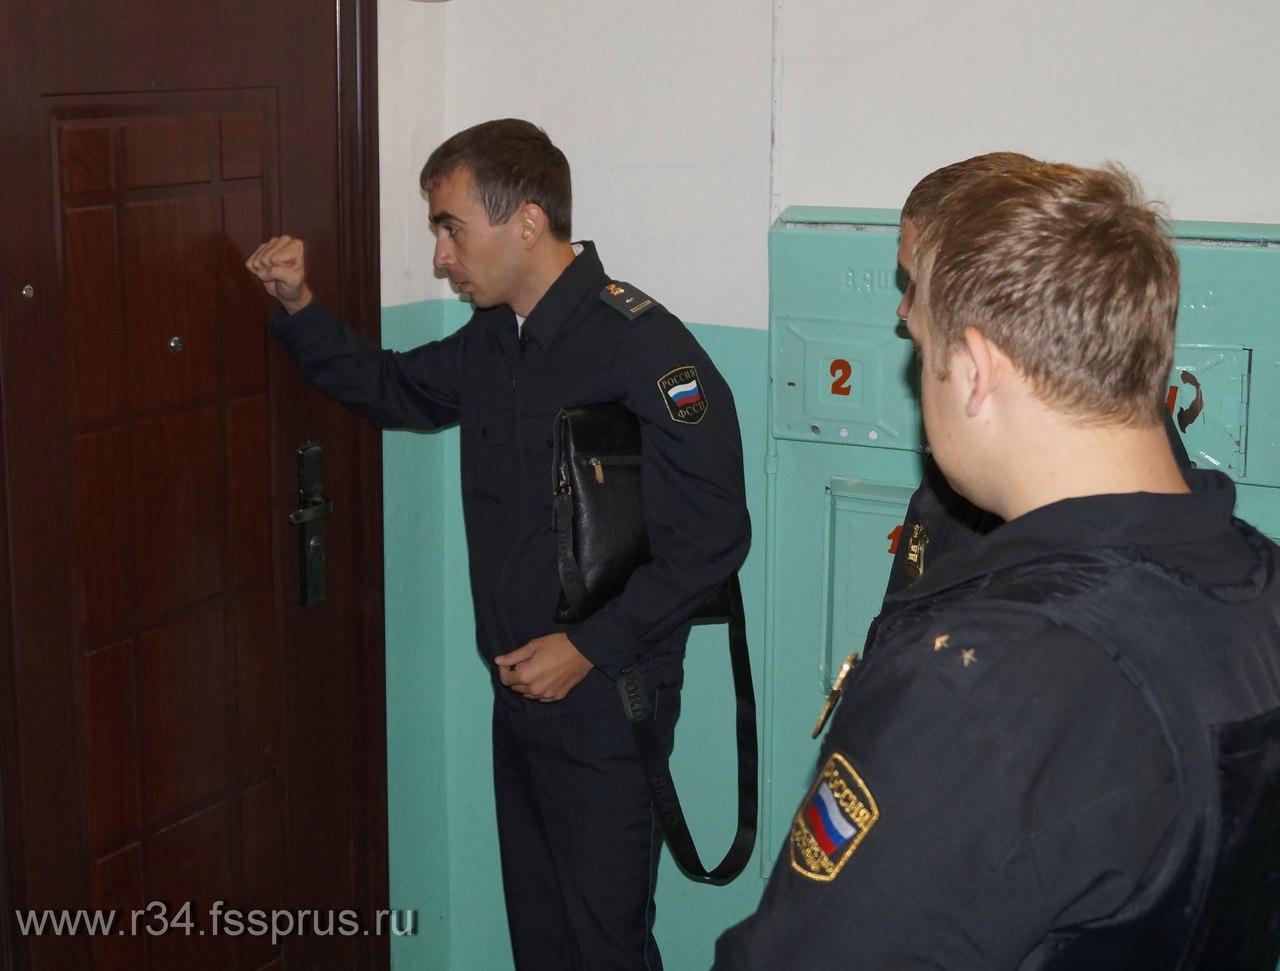 Волгоградцы должны банкам неменее 15 млрд. руб.